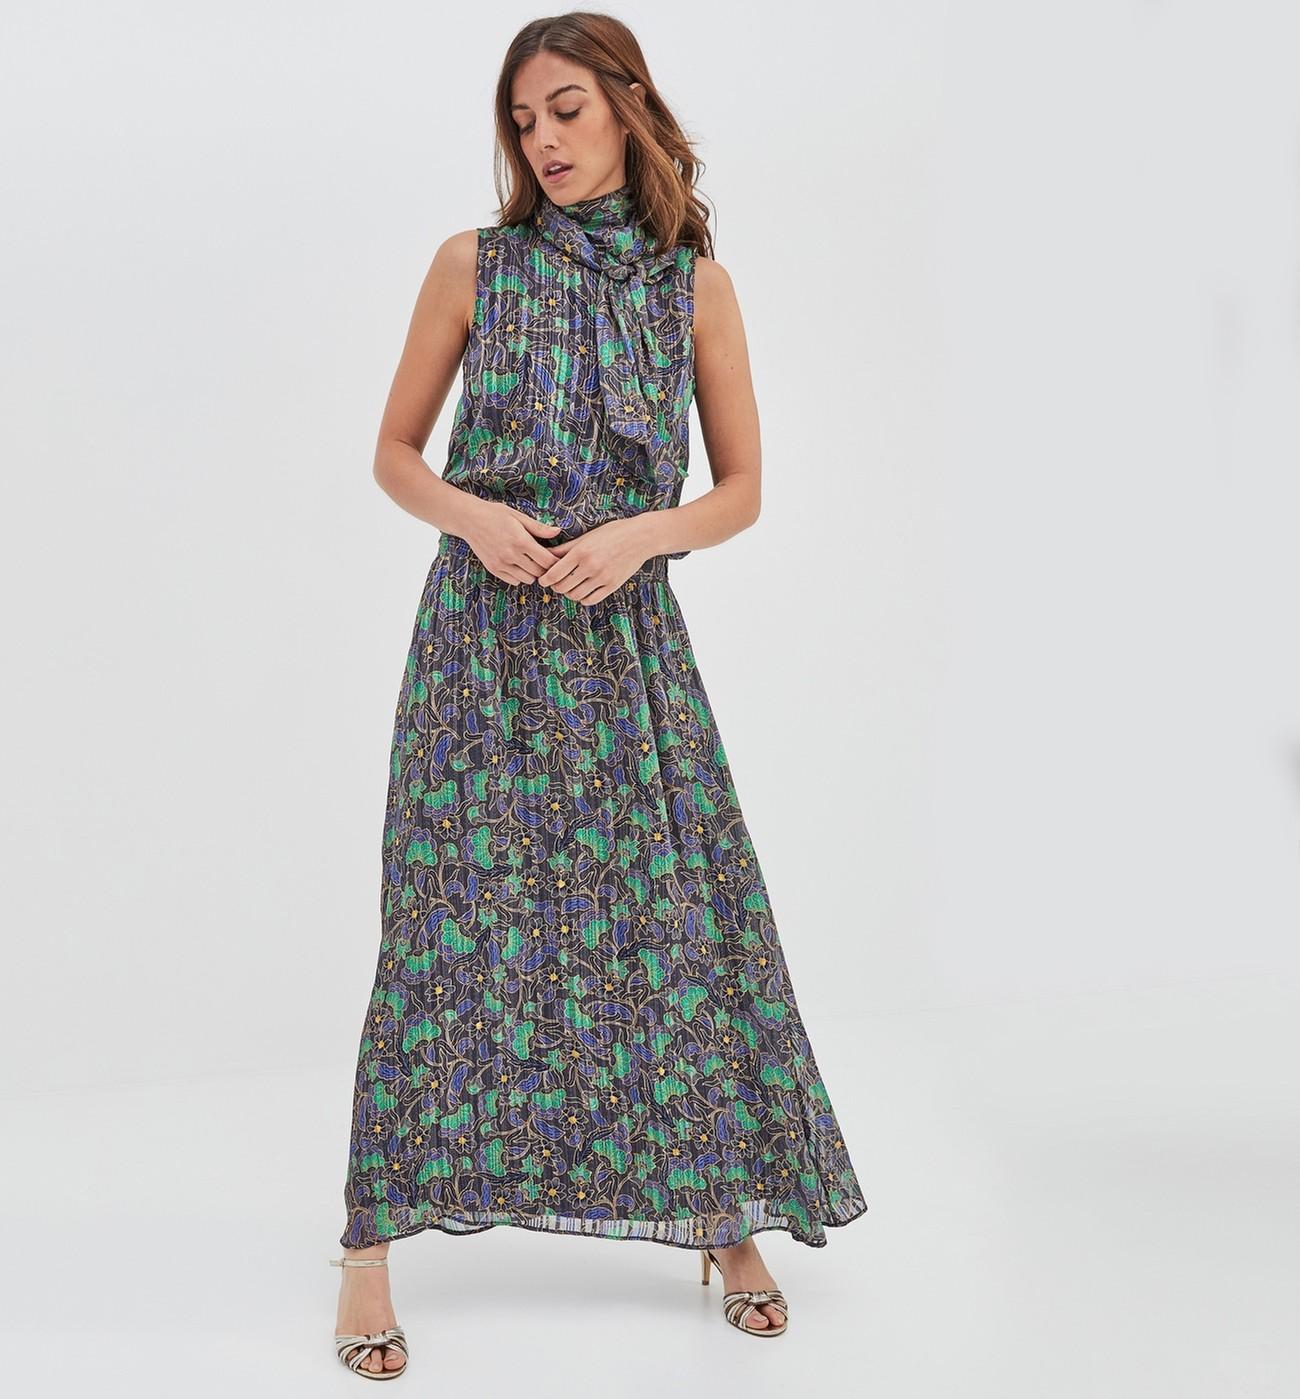 d5ff2b13daddf5 Longue robe imprimée marine Promod - Robe Femme Promod